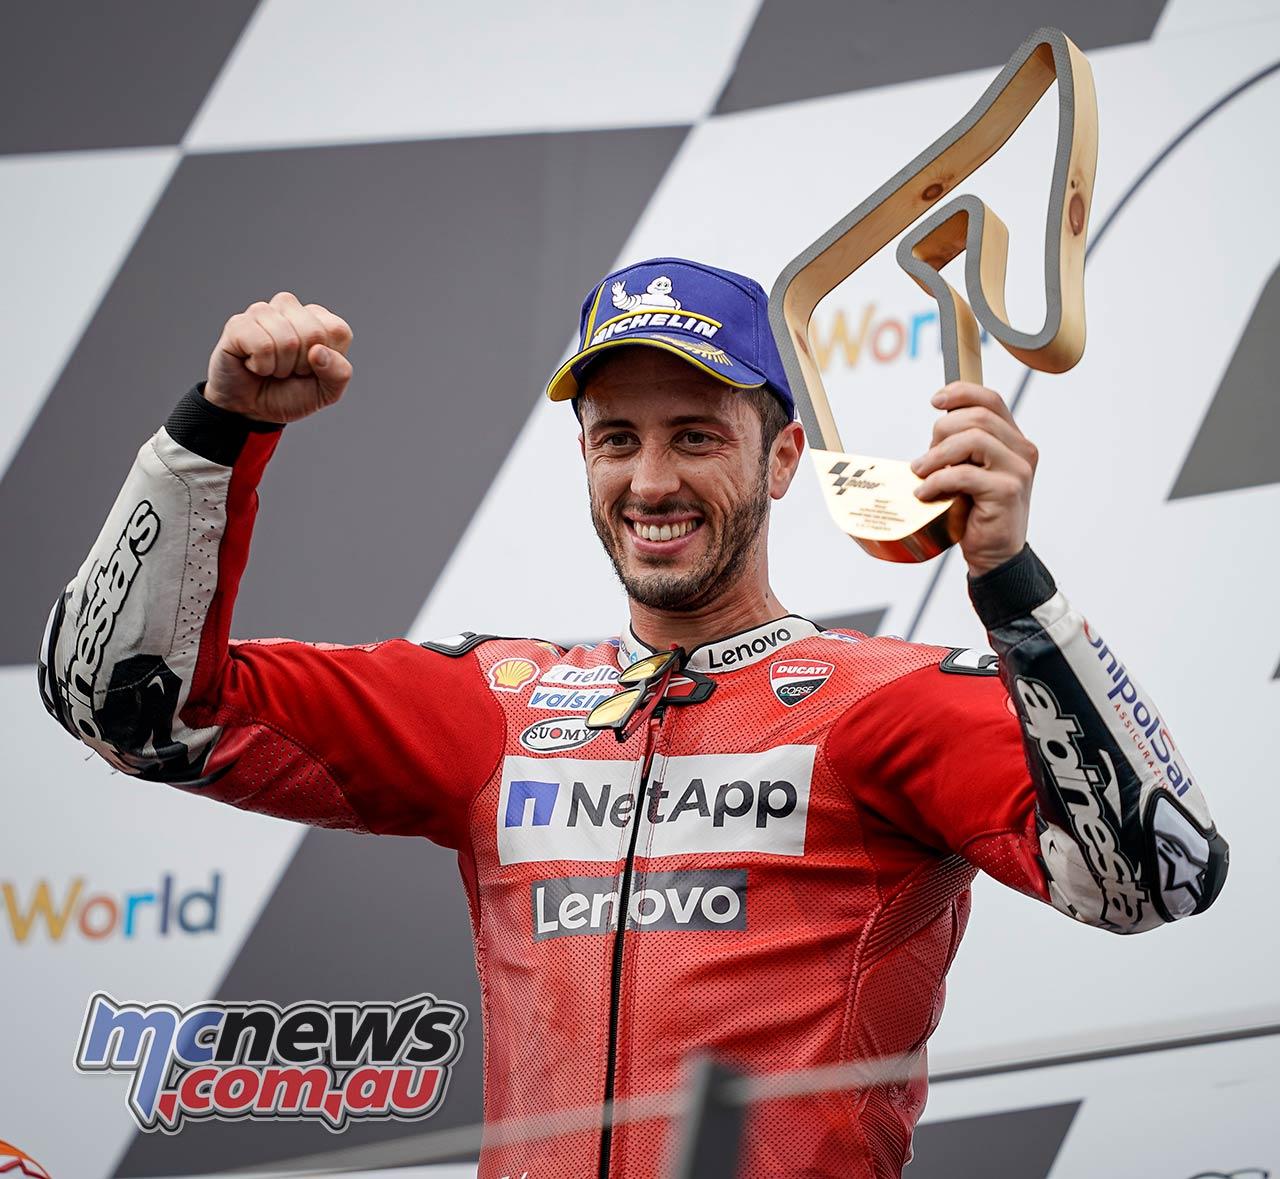 MotoGP Rnd RedBullRing Race Dovizioso Trophy